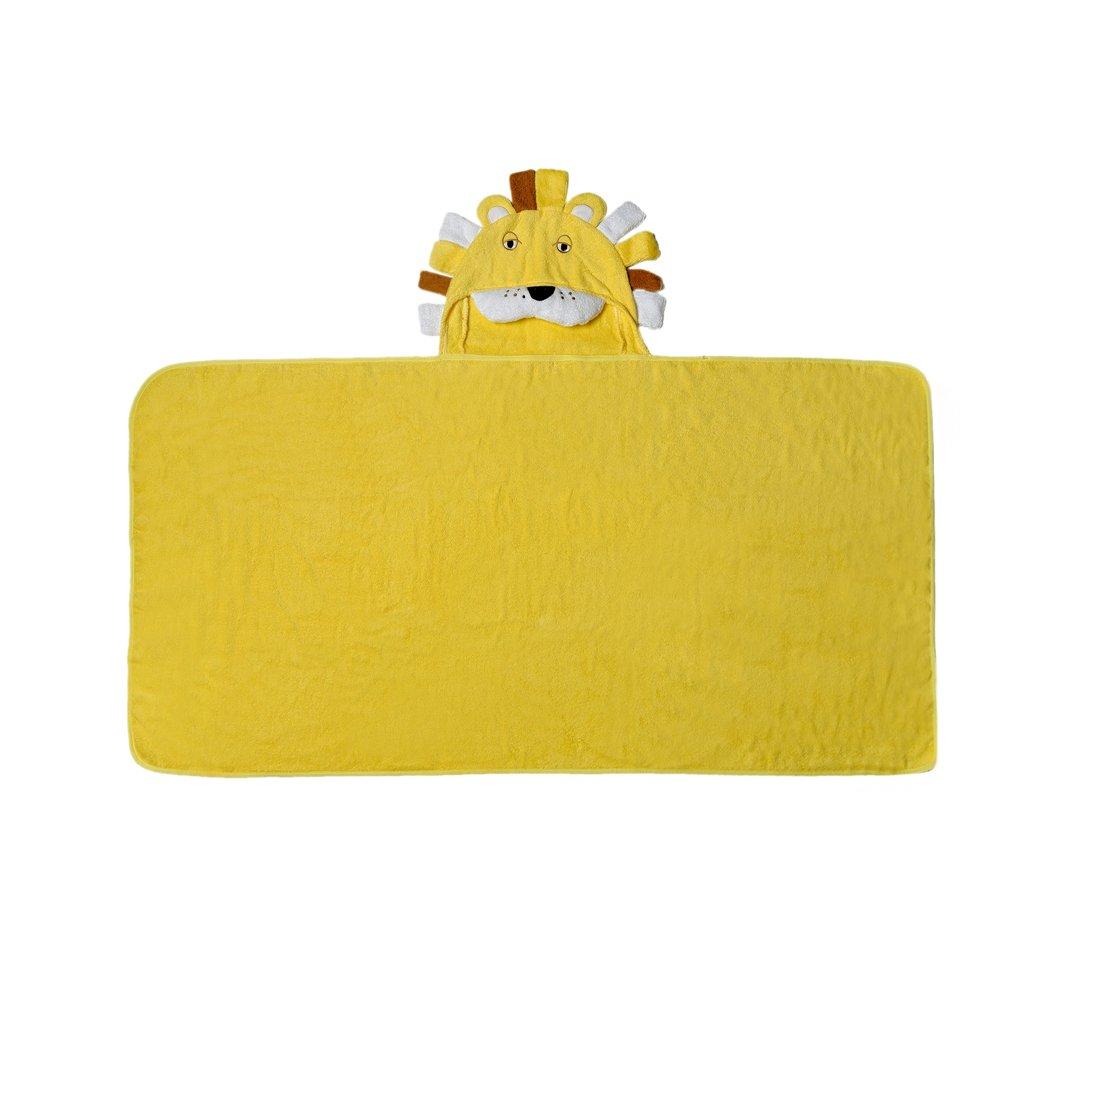 LoveKids Boys or Girls Hooded Bath Towel 100% Cotton use for Bath, Beach, Pool(Lion-L)